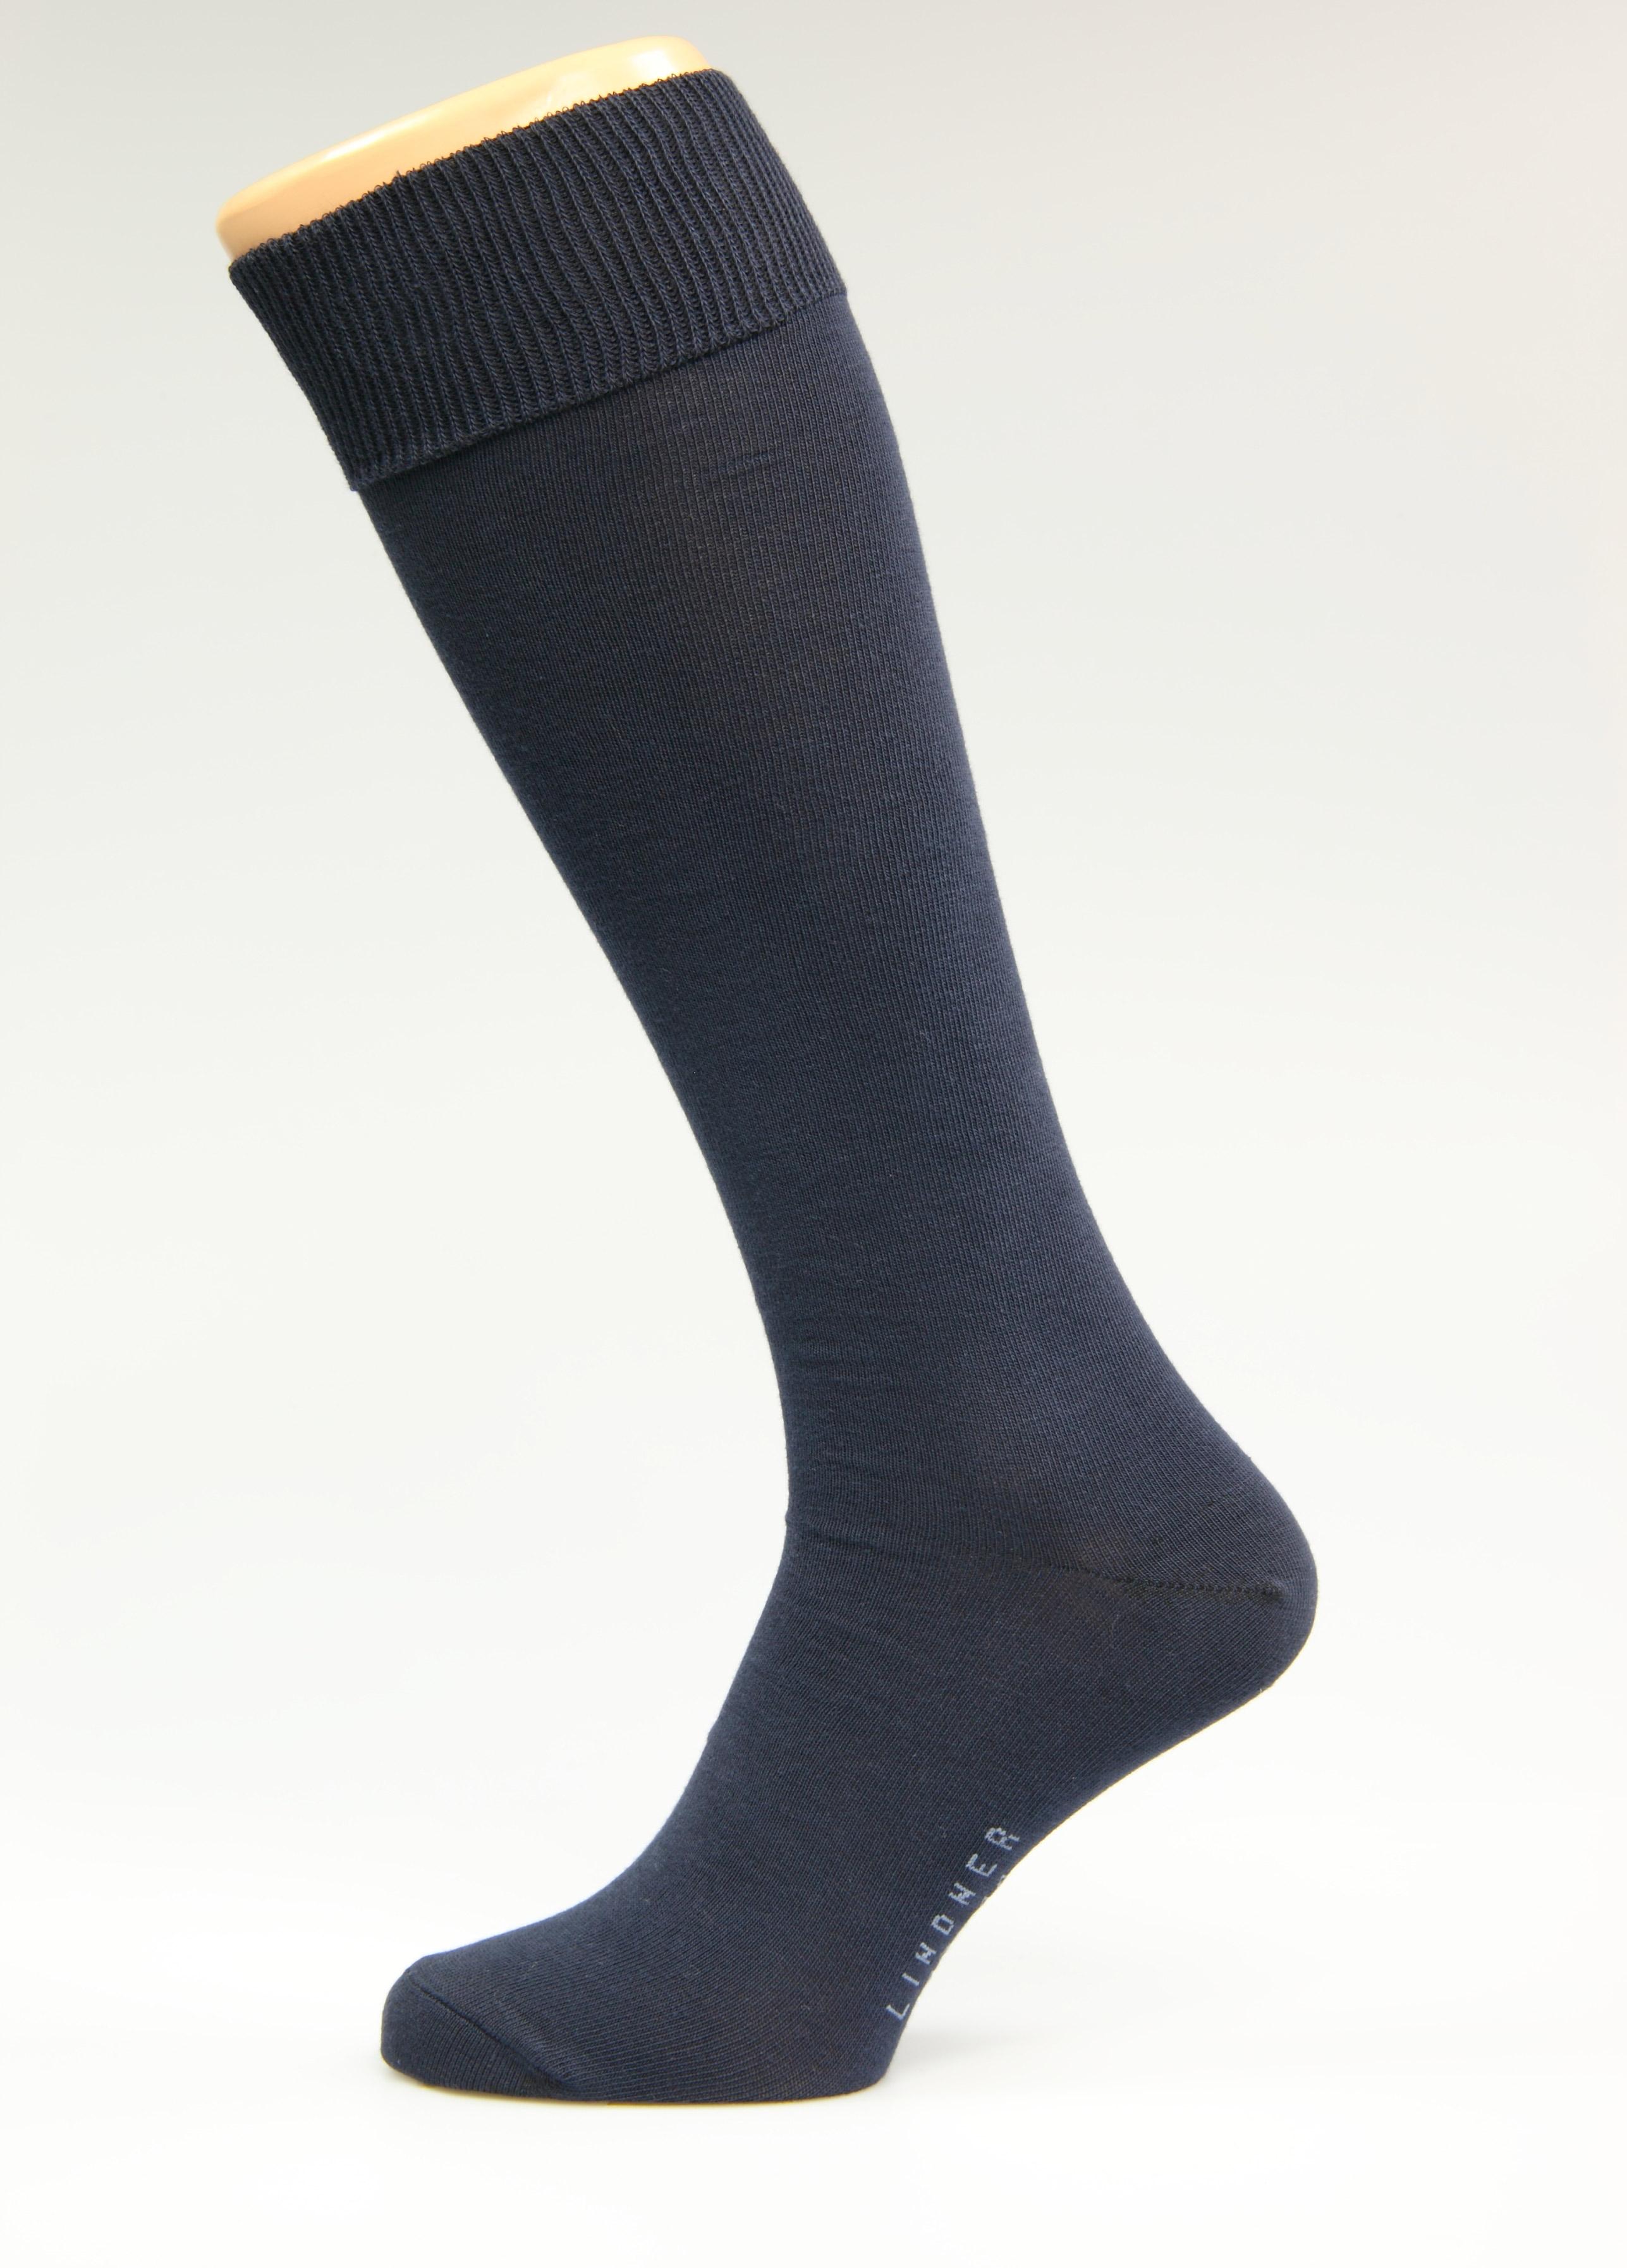 dunkelblaue-Kniestr-mpfe-Gr-sse-45-47